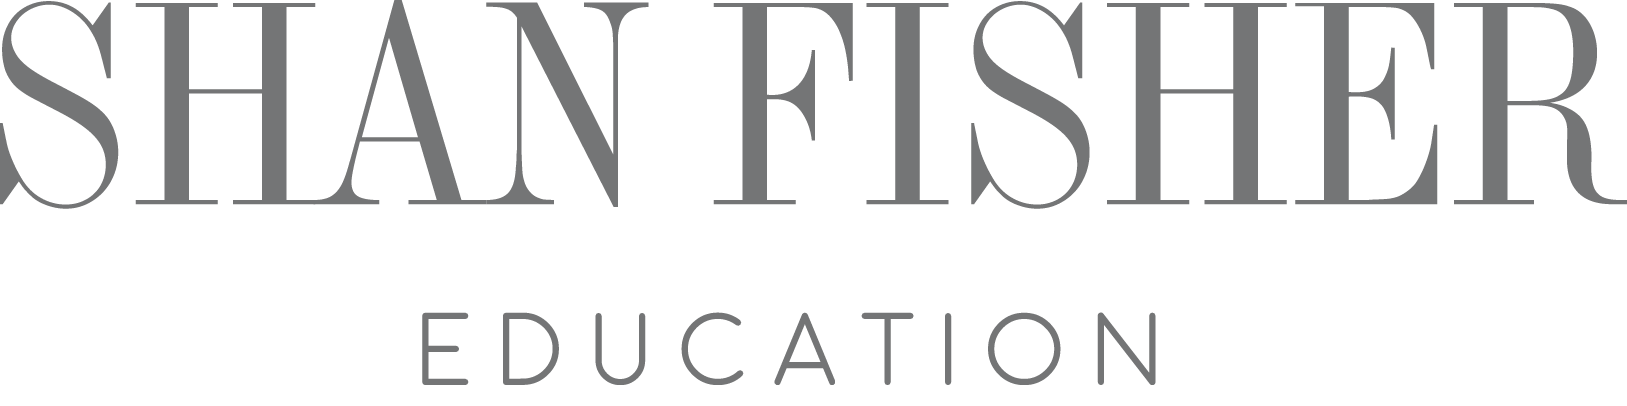 Shan-Fisher-Education-Grey